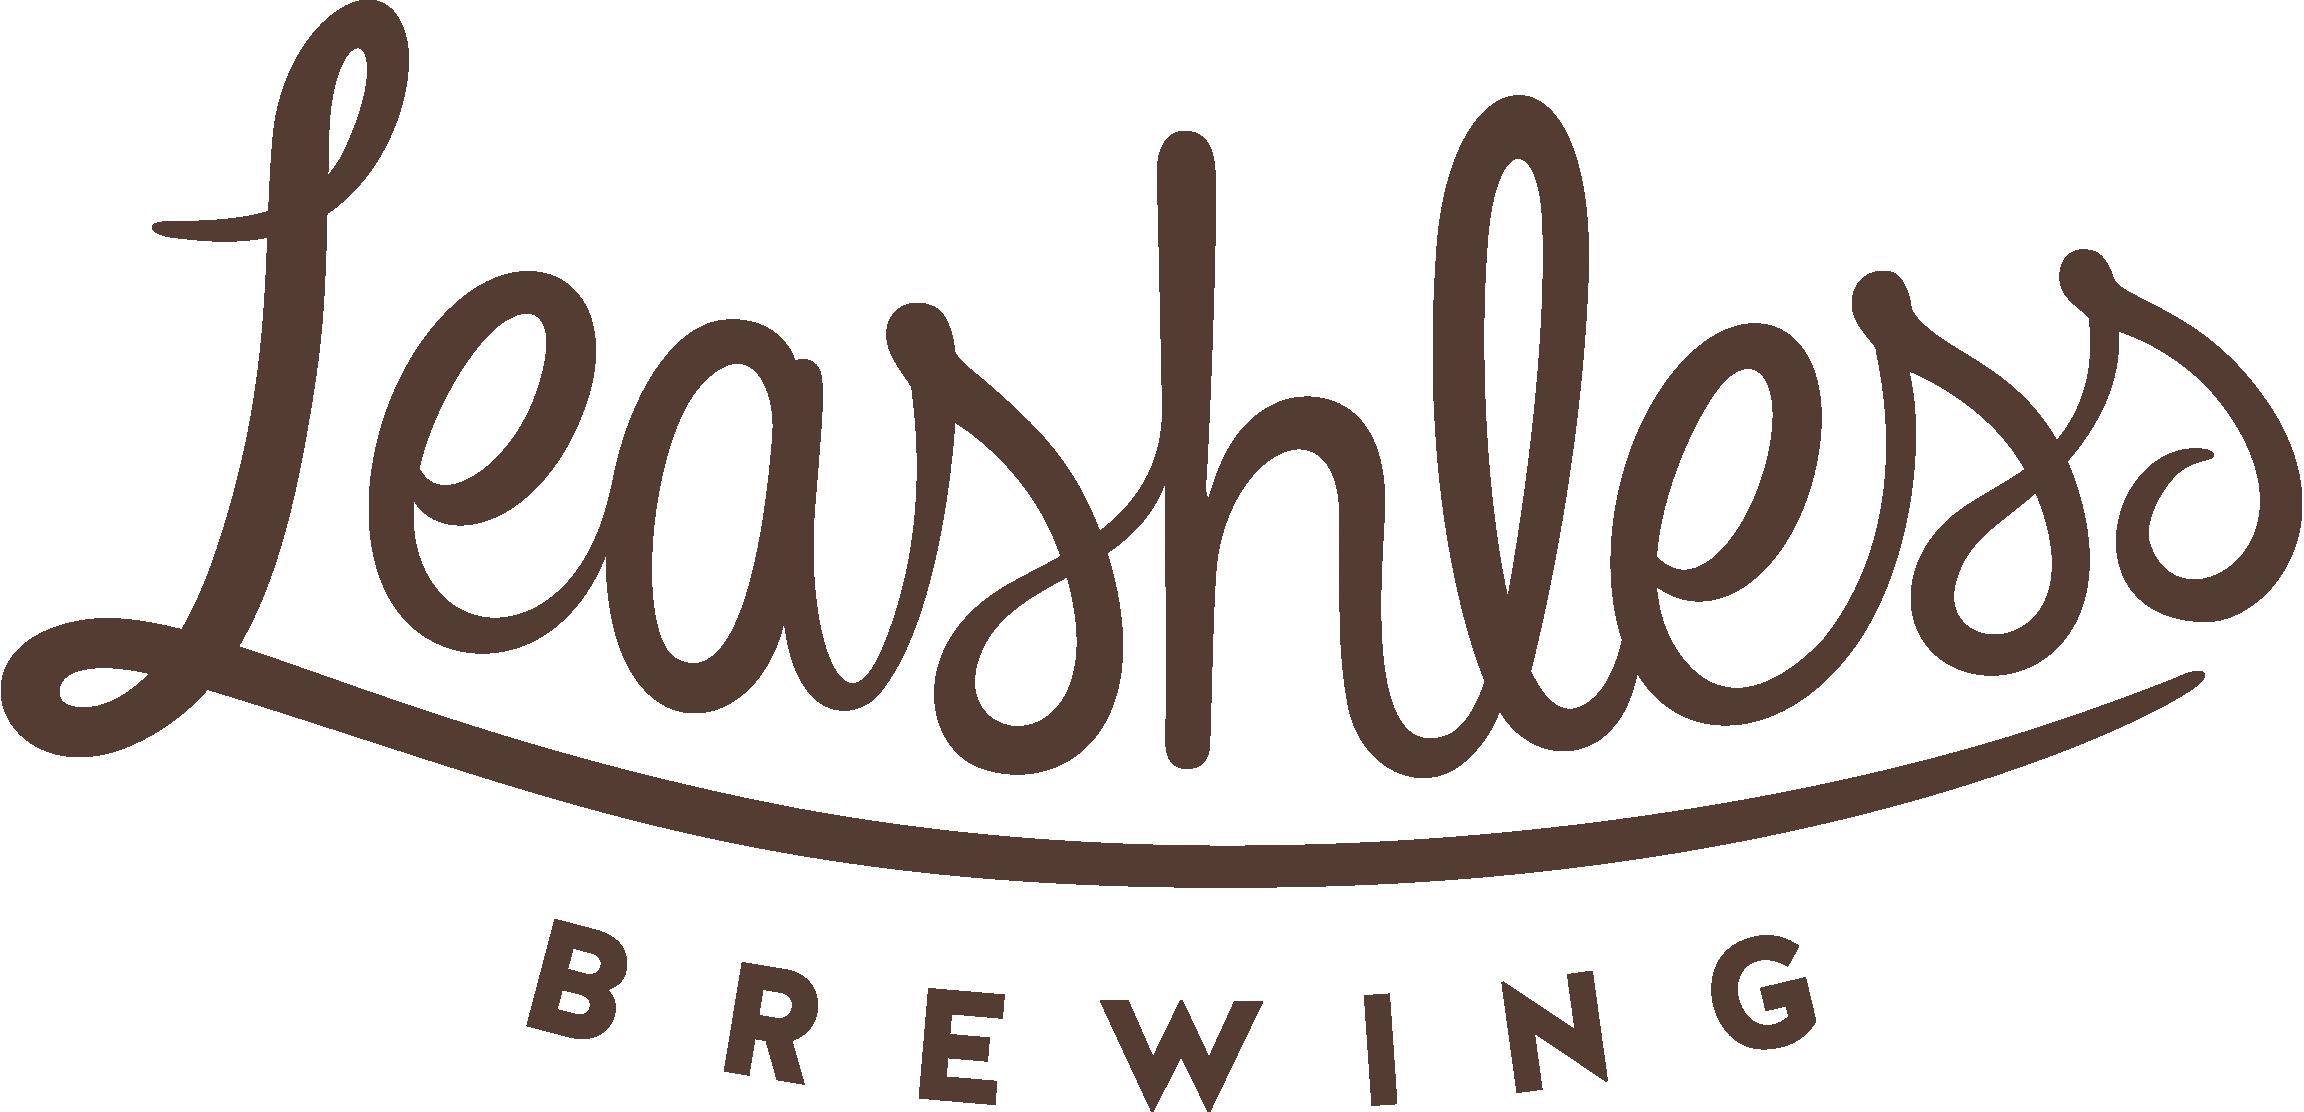 Leashless Brewing - script logo in color